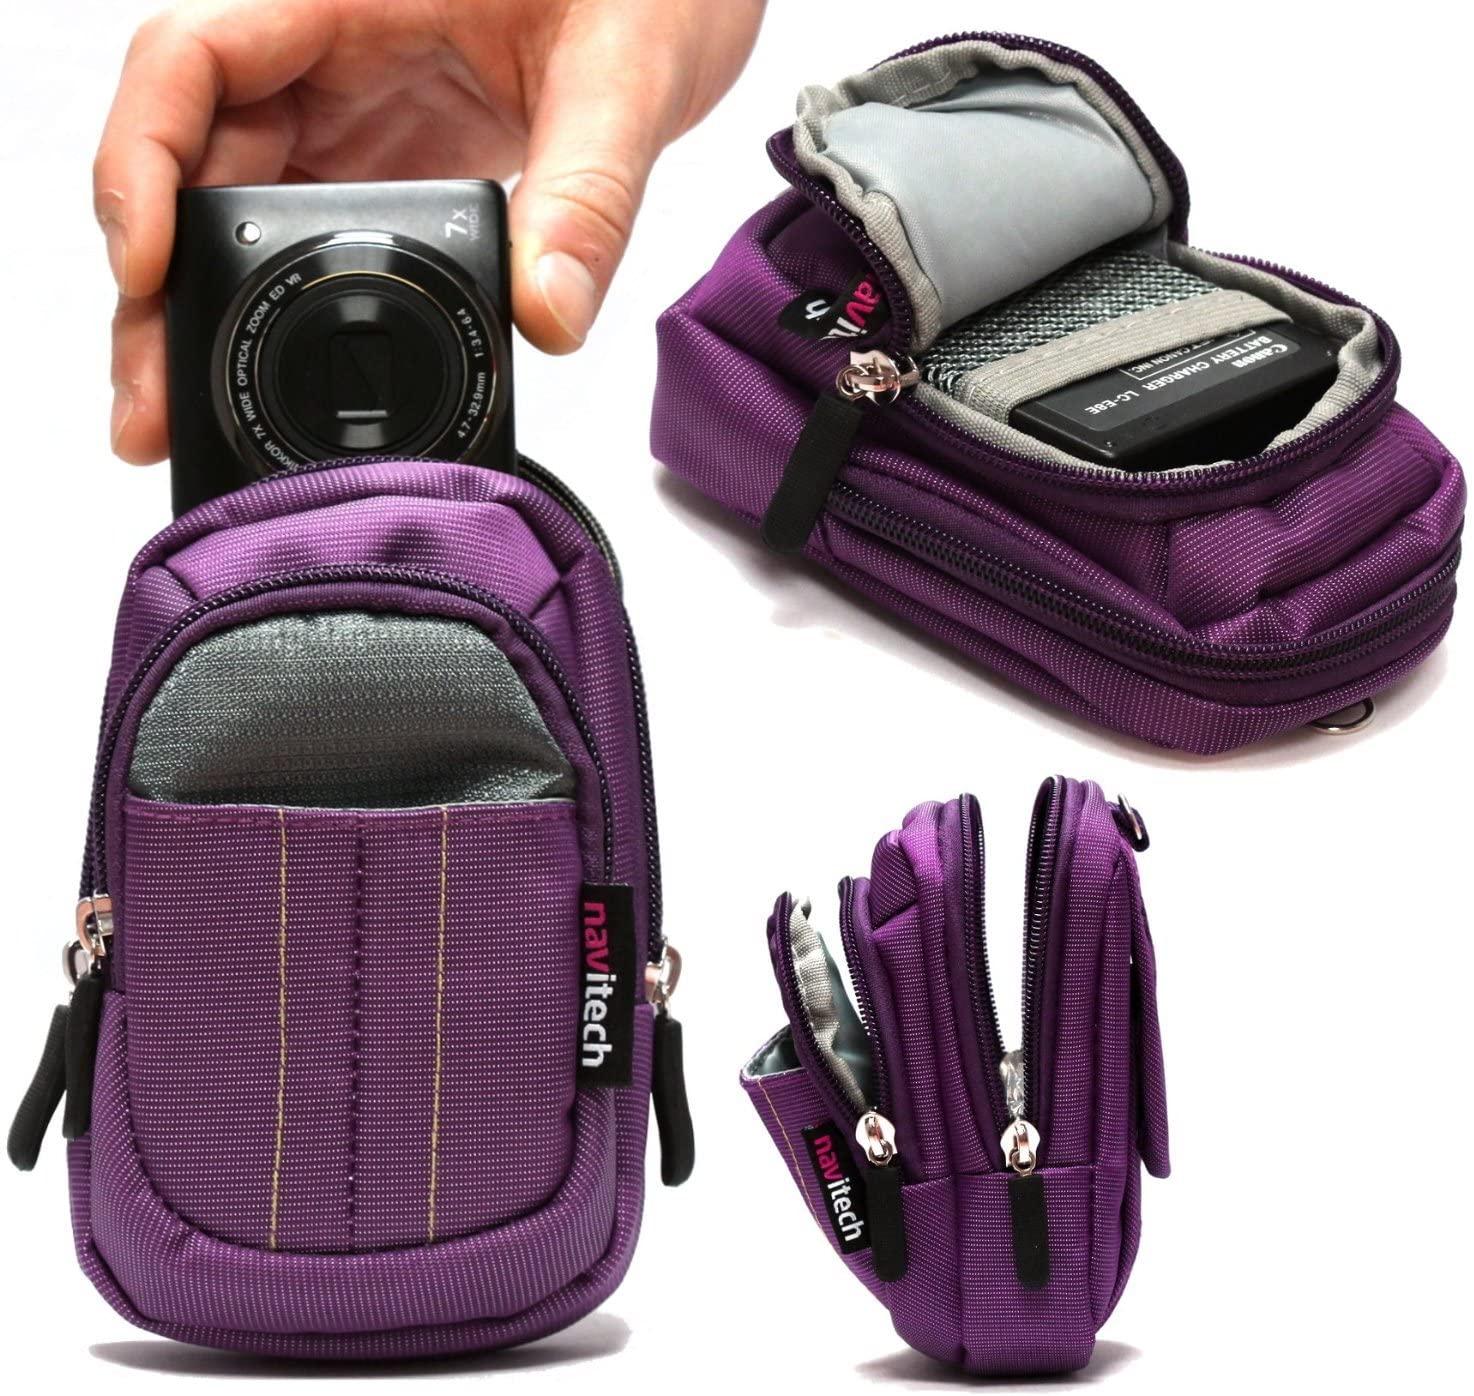 Navitech Purple Digital Camera Case Bag Compatible with The Vivitar ViviCam F127